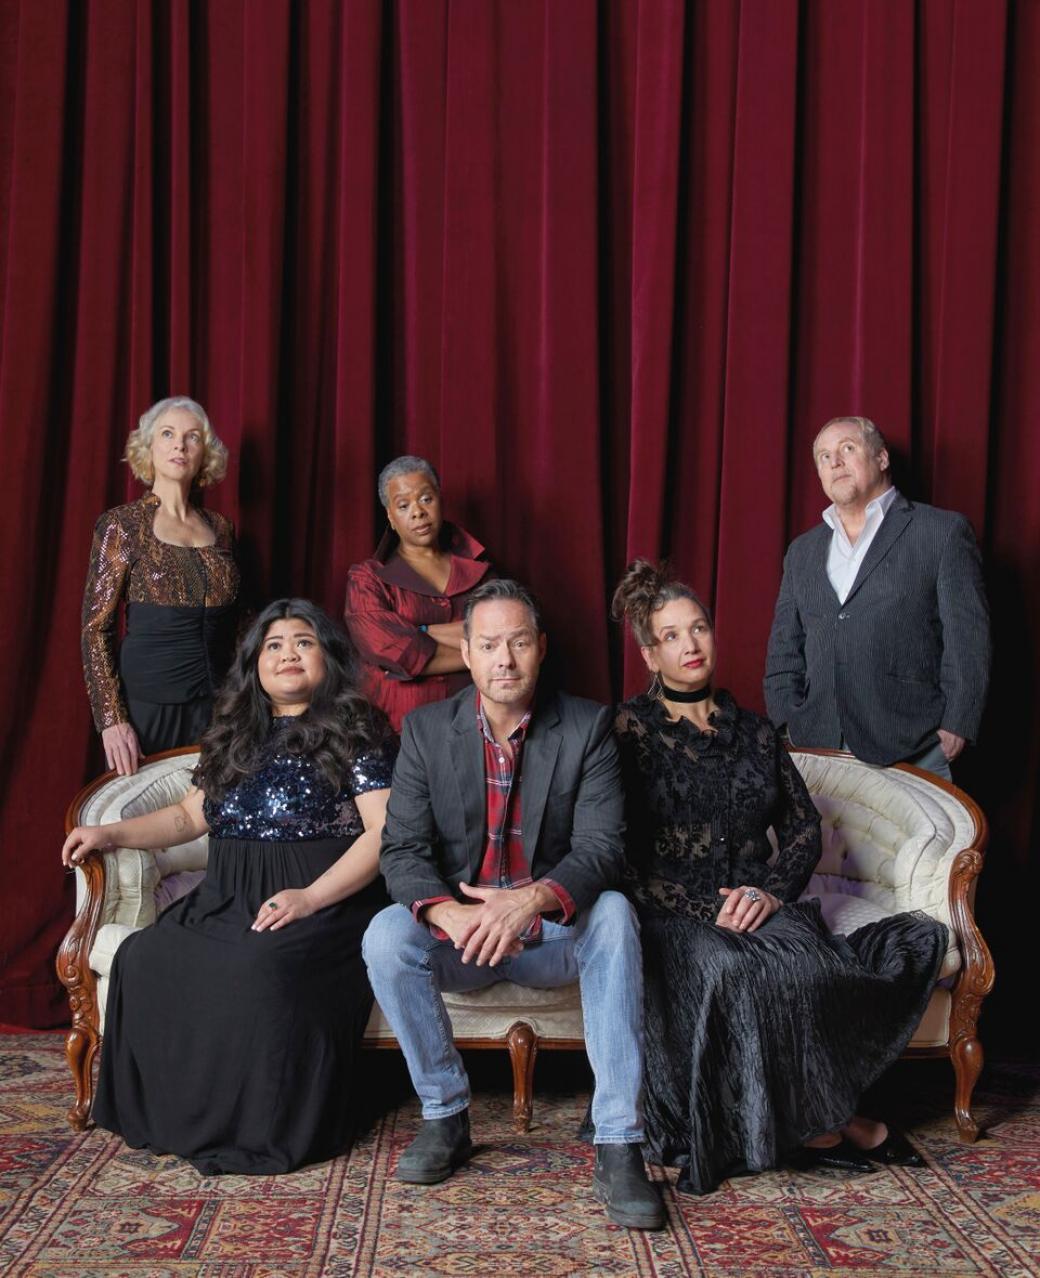 Teatro La Quindicina  presents: The Finest of Strangers